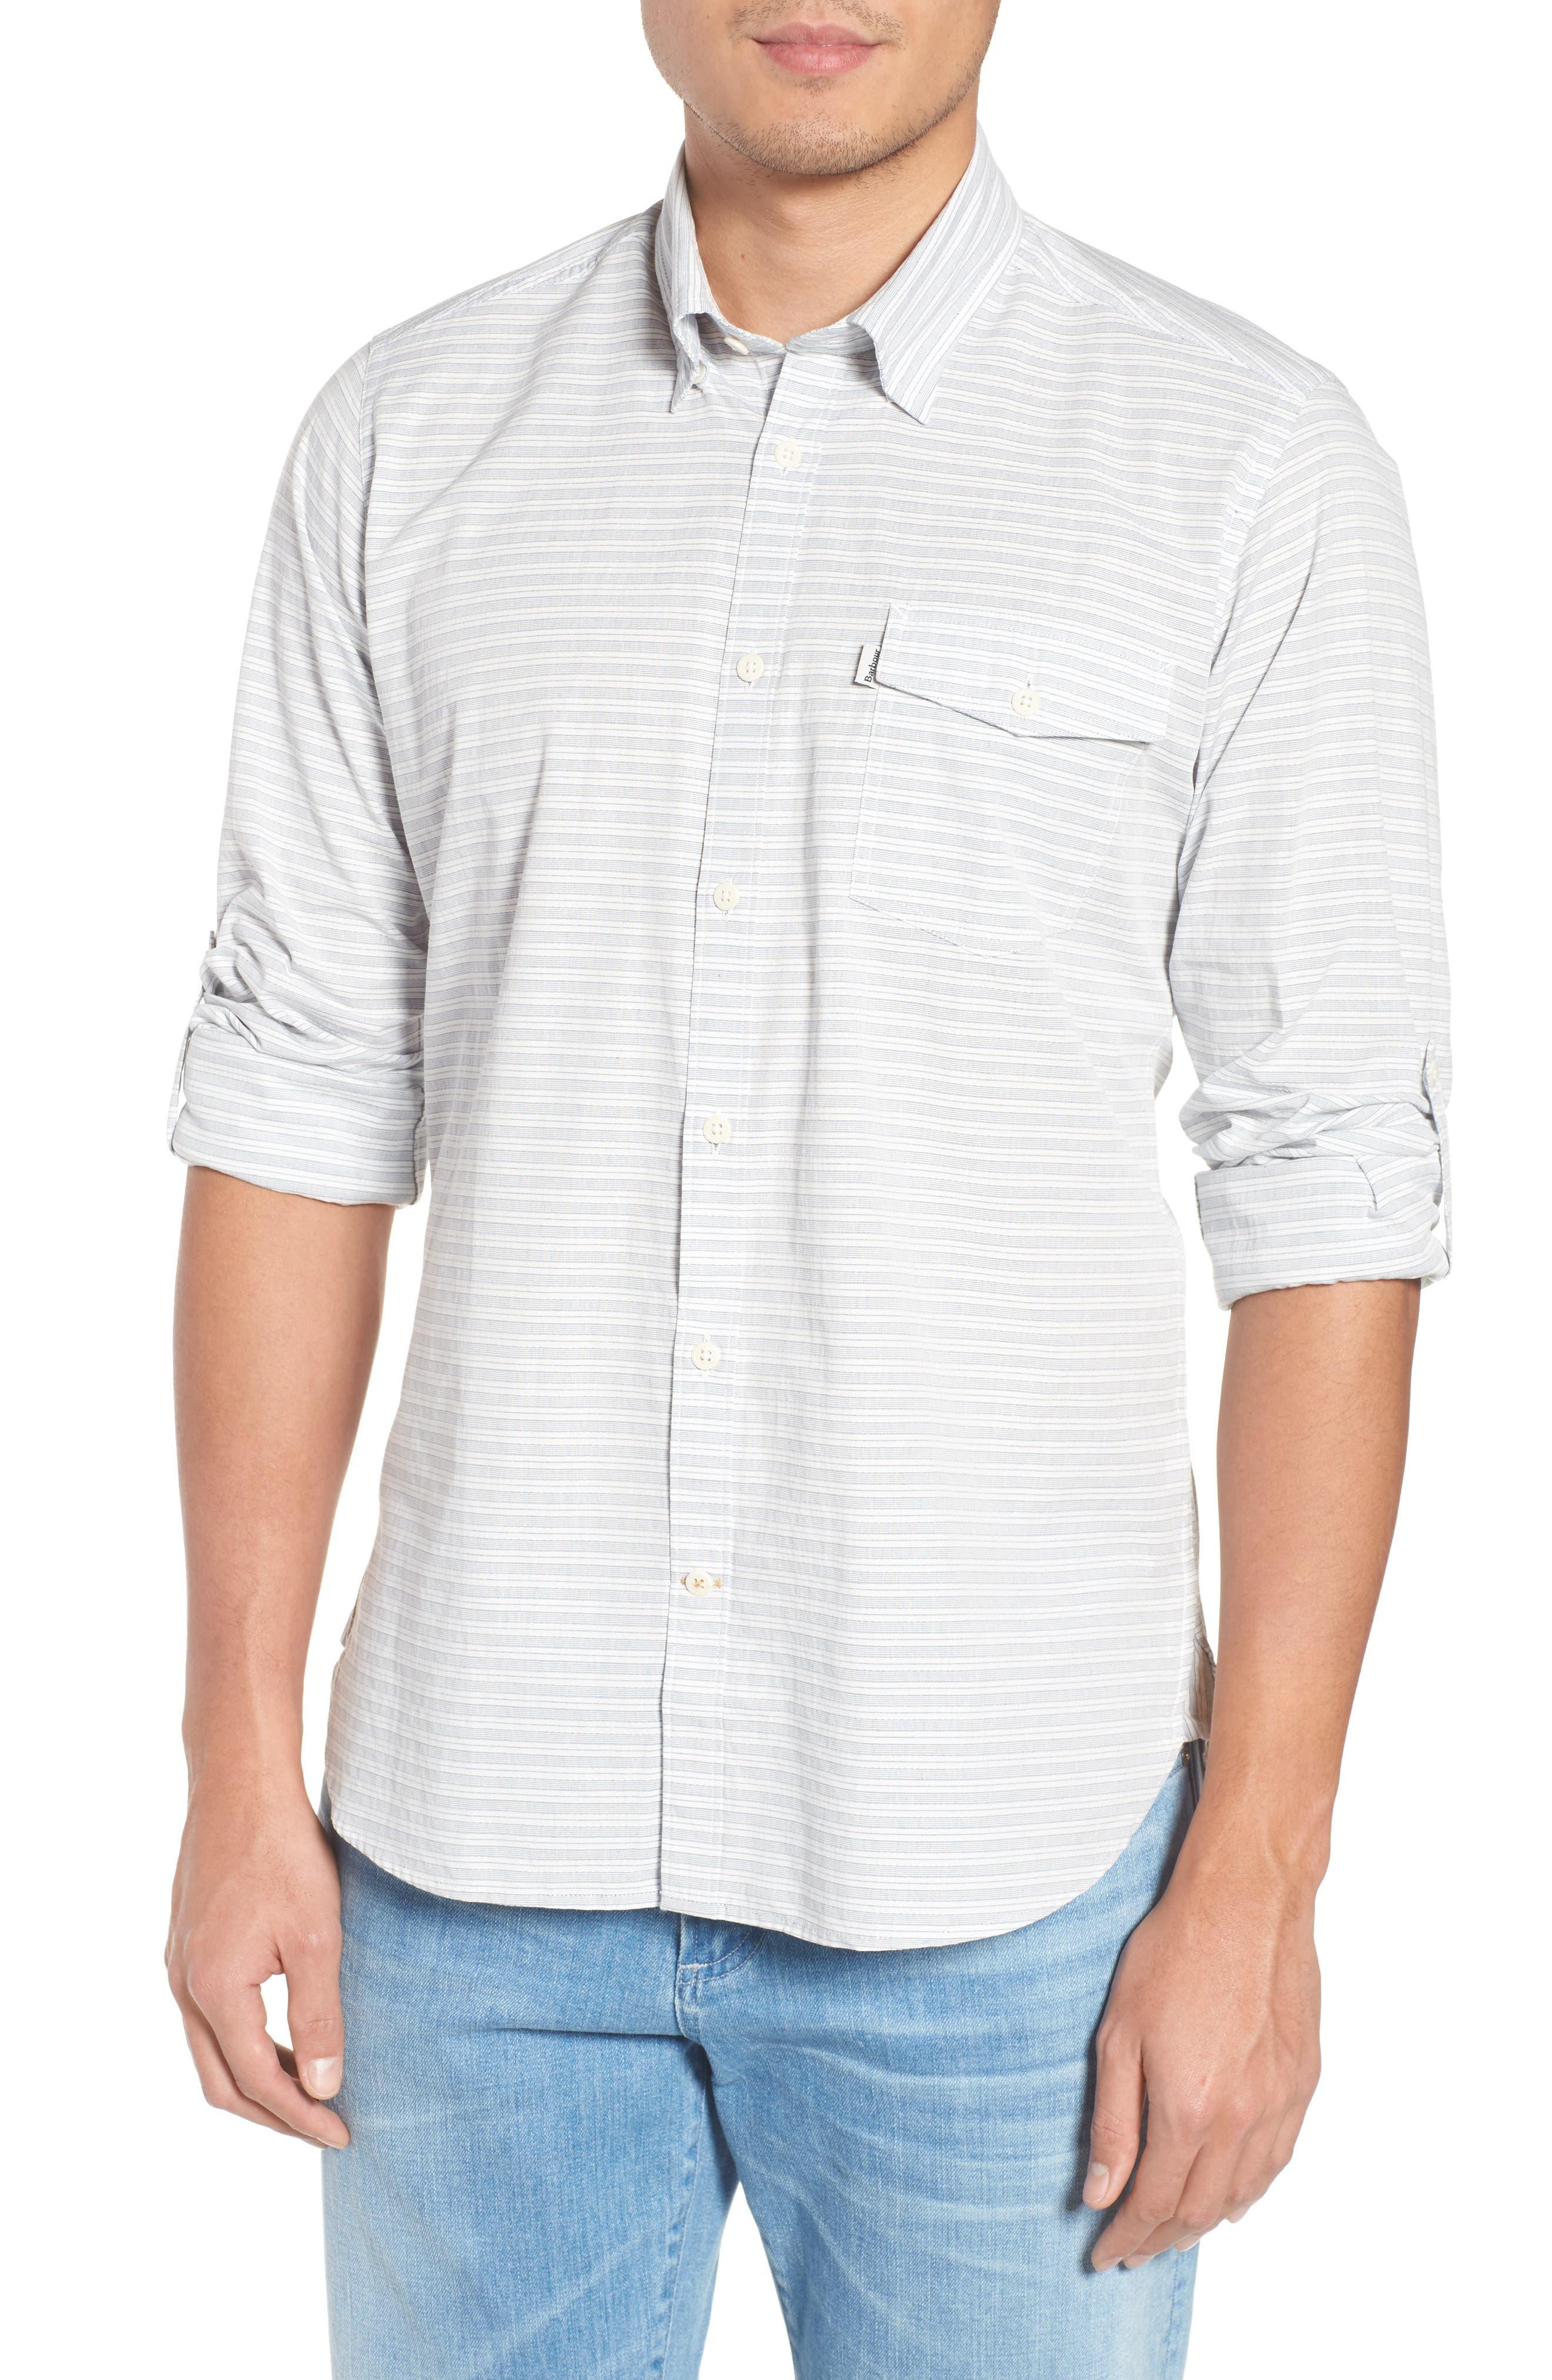 Huchen Regular Fit Stripe Sport Shirt,                             Main thumbnail 1, color,                             100